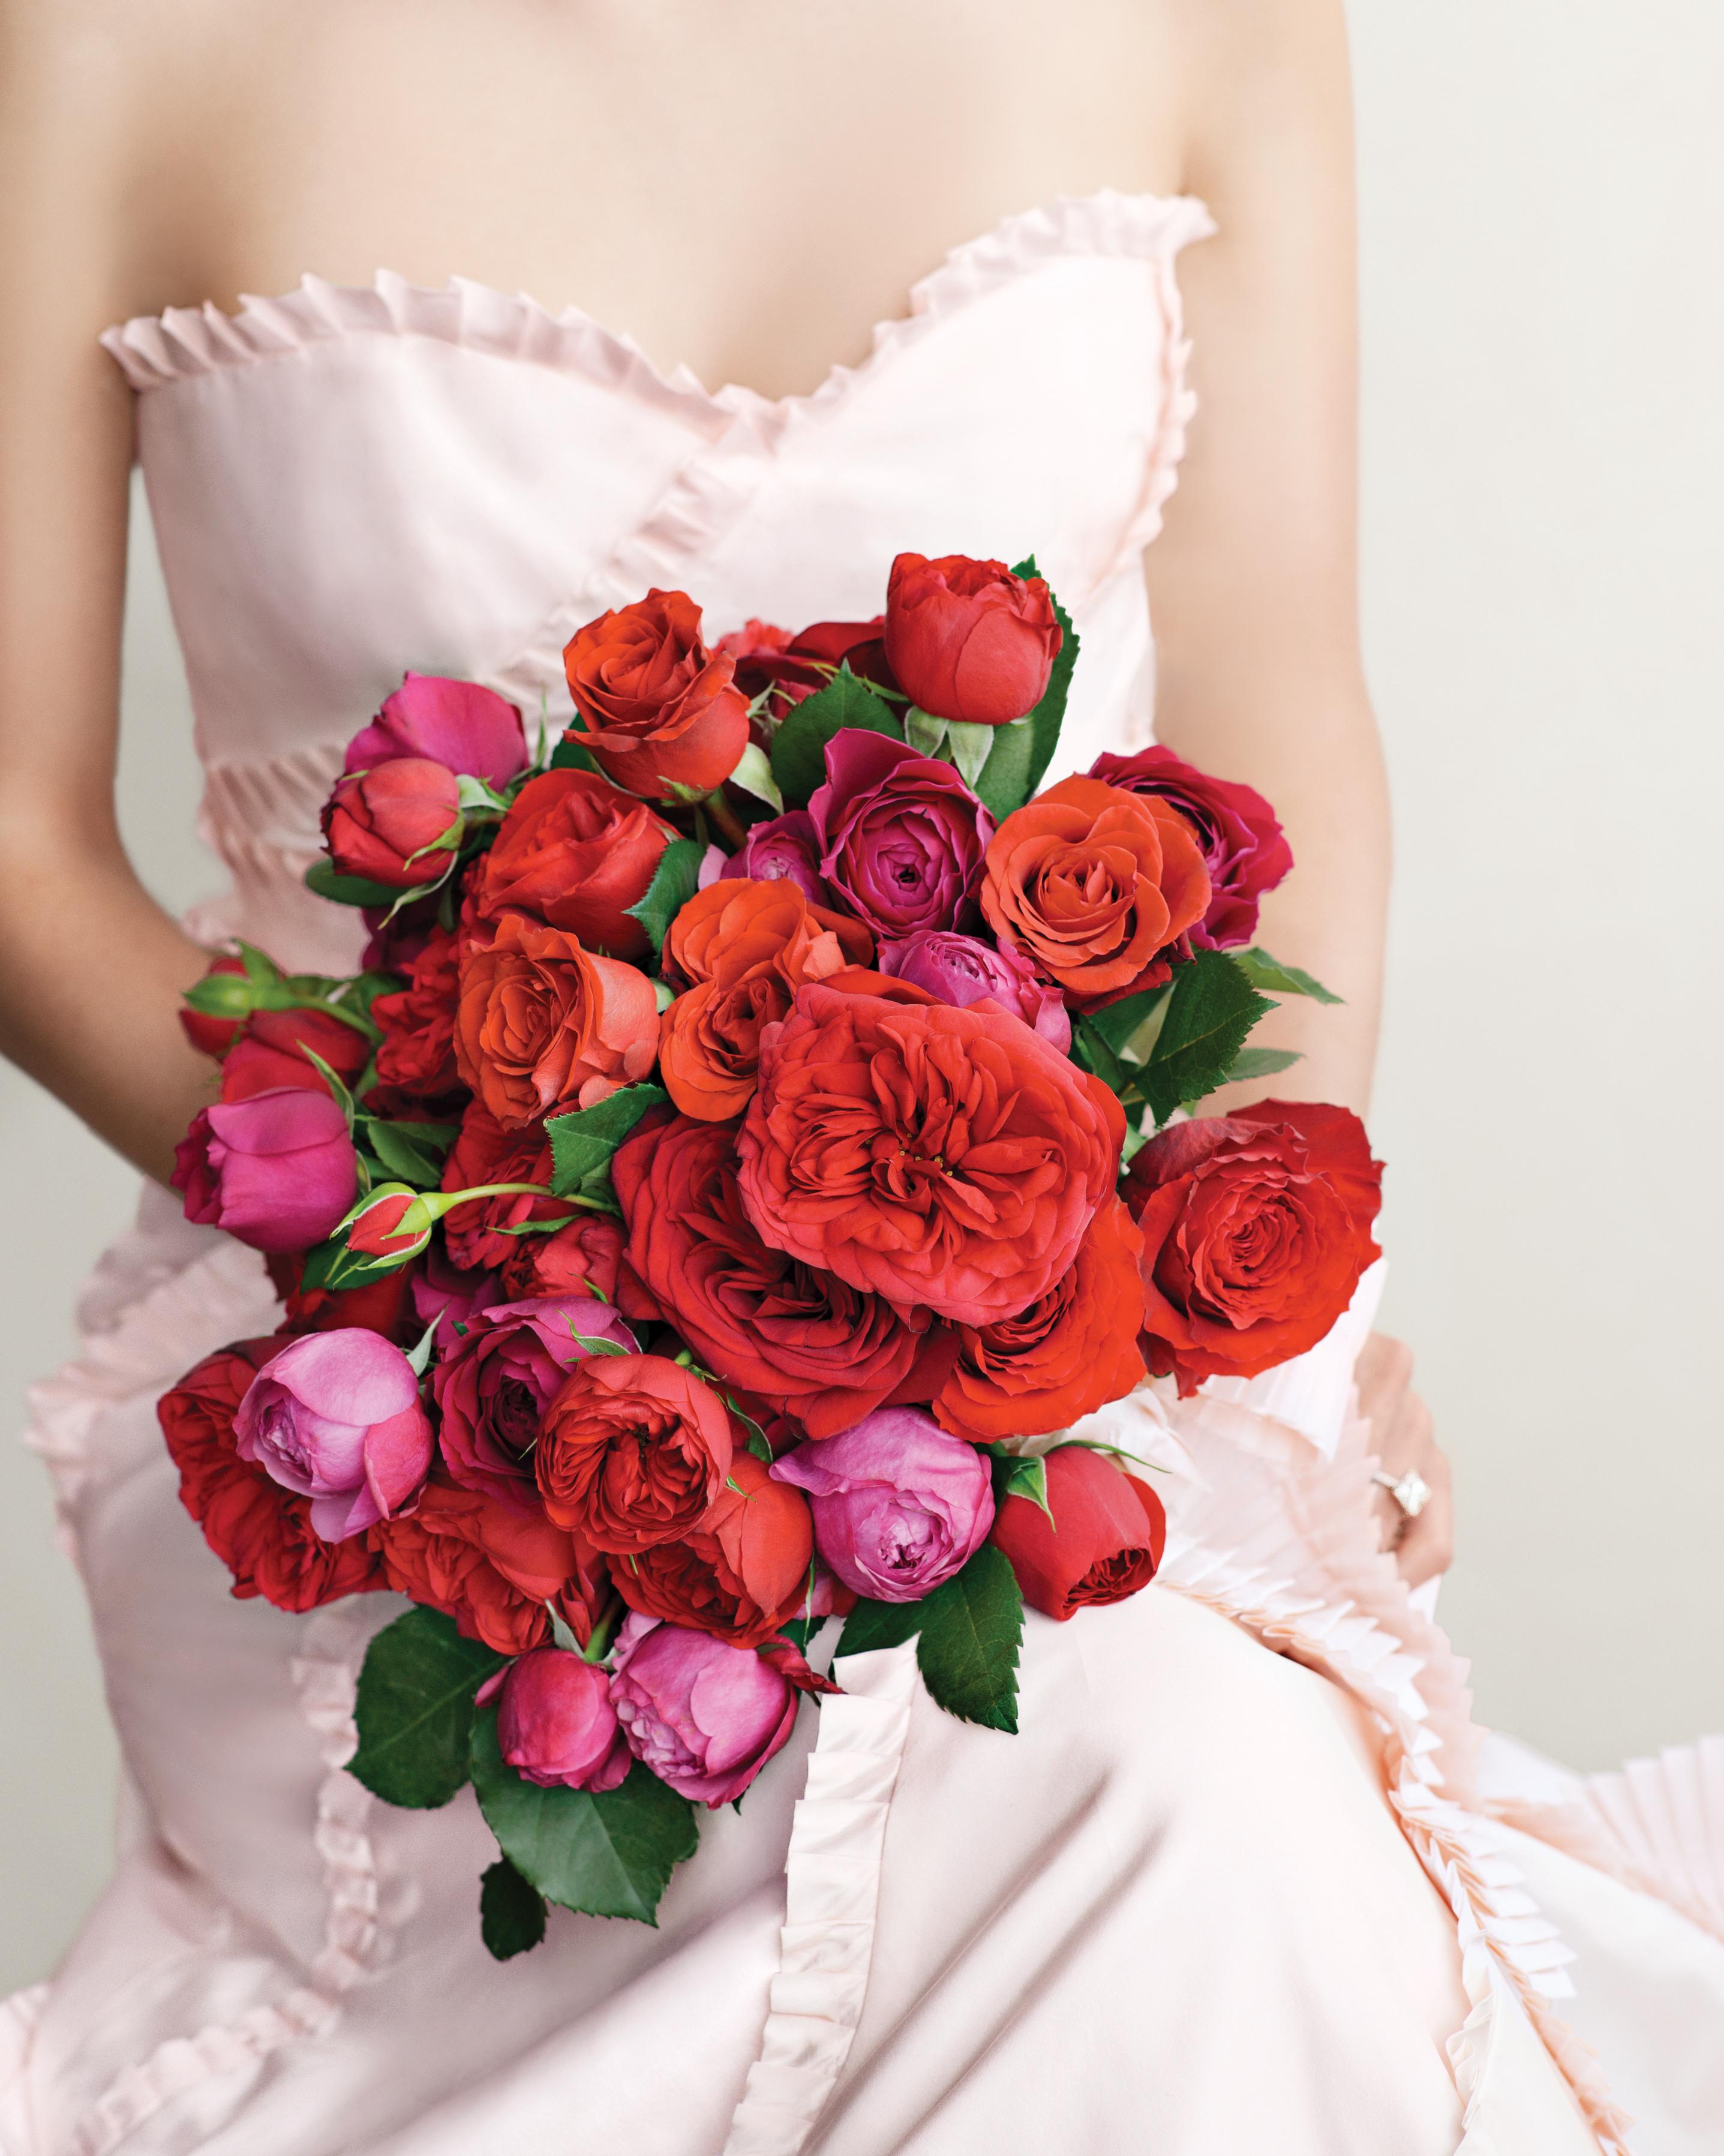 red-wedding-bouquets-mwd106103-0115.jpg